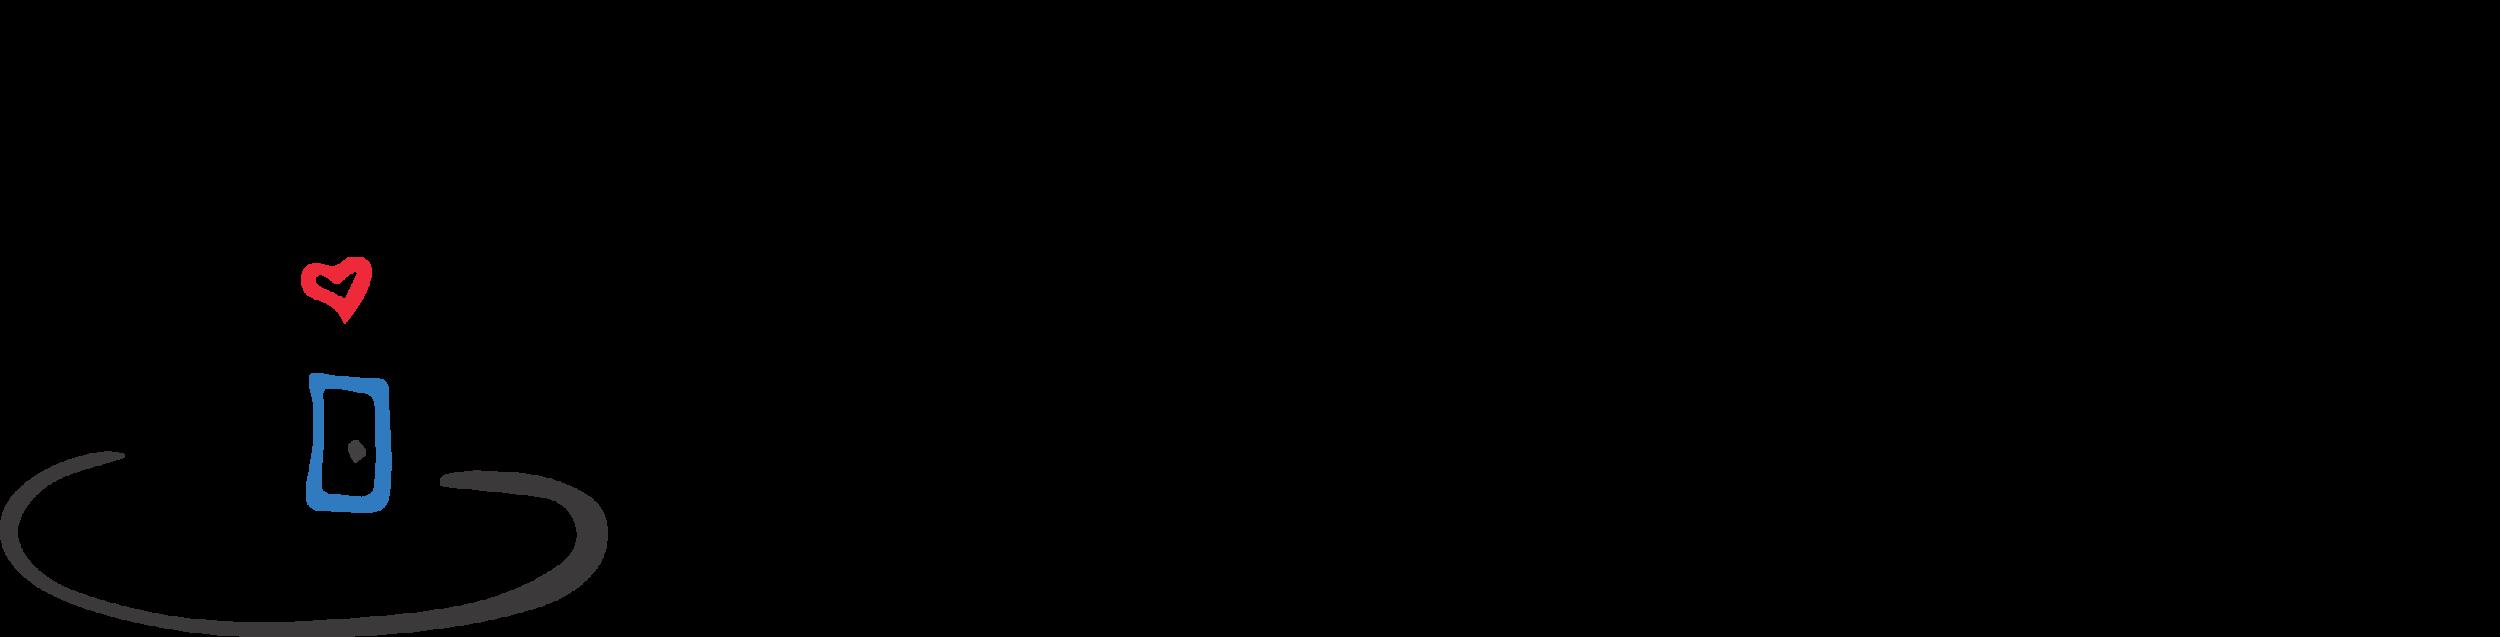 2018 jeremiahs place logo wtagline CMYK.png